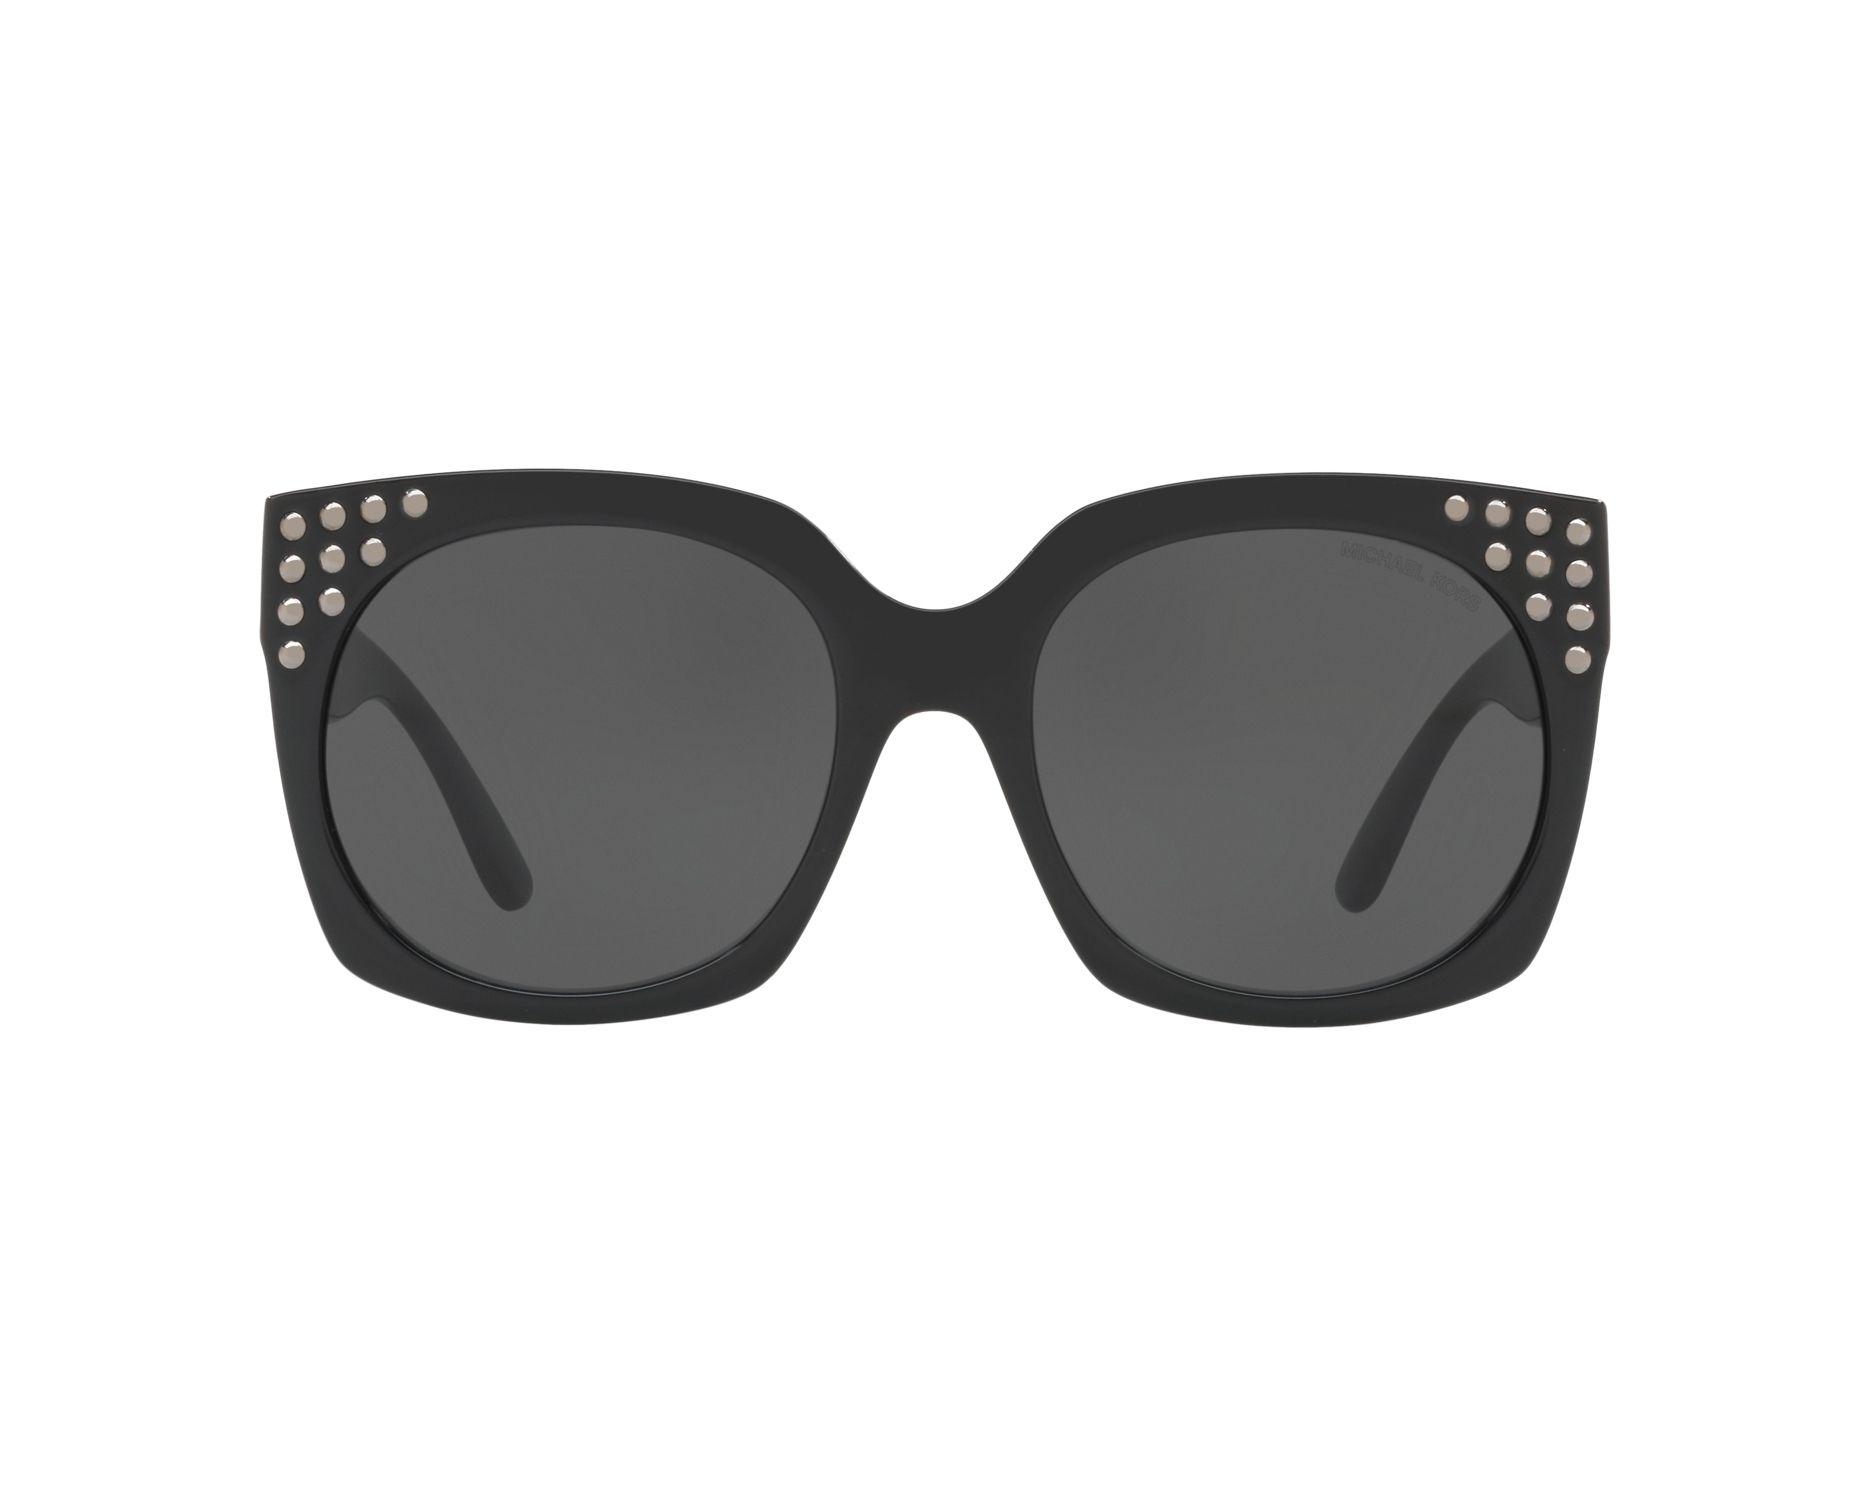 UPC 725125997638 product image for Michael Kors Destin Women's Sunglasses - Black/Grey Solid | upcitemdb.com